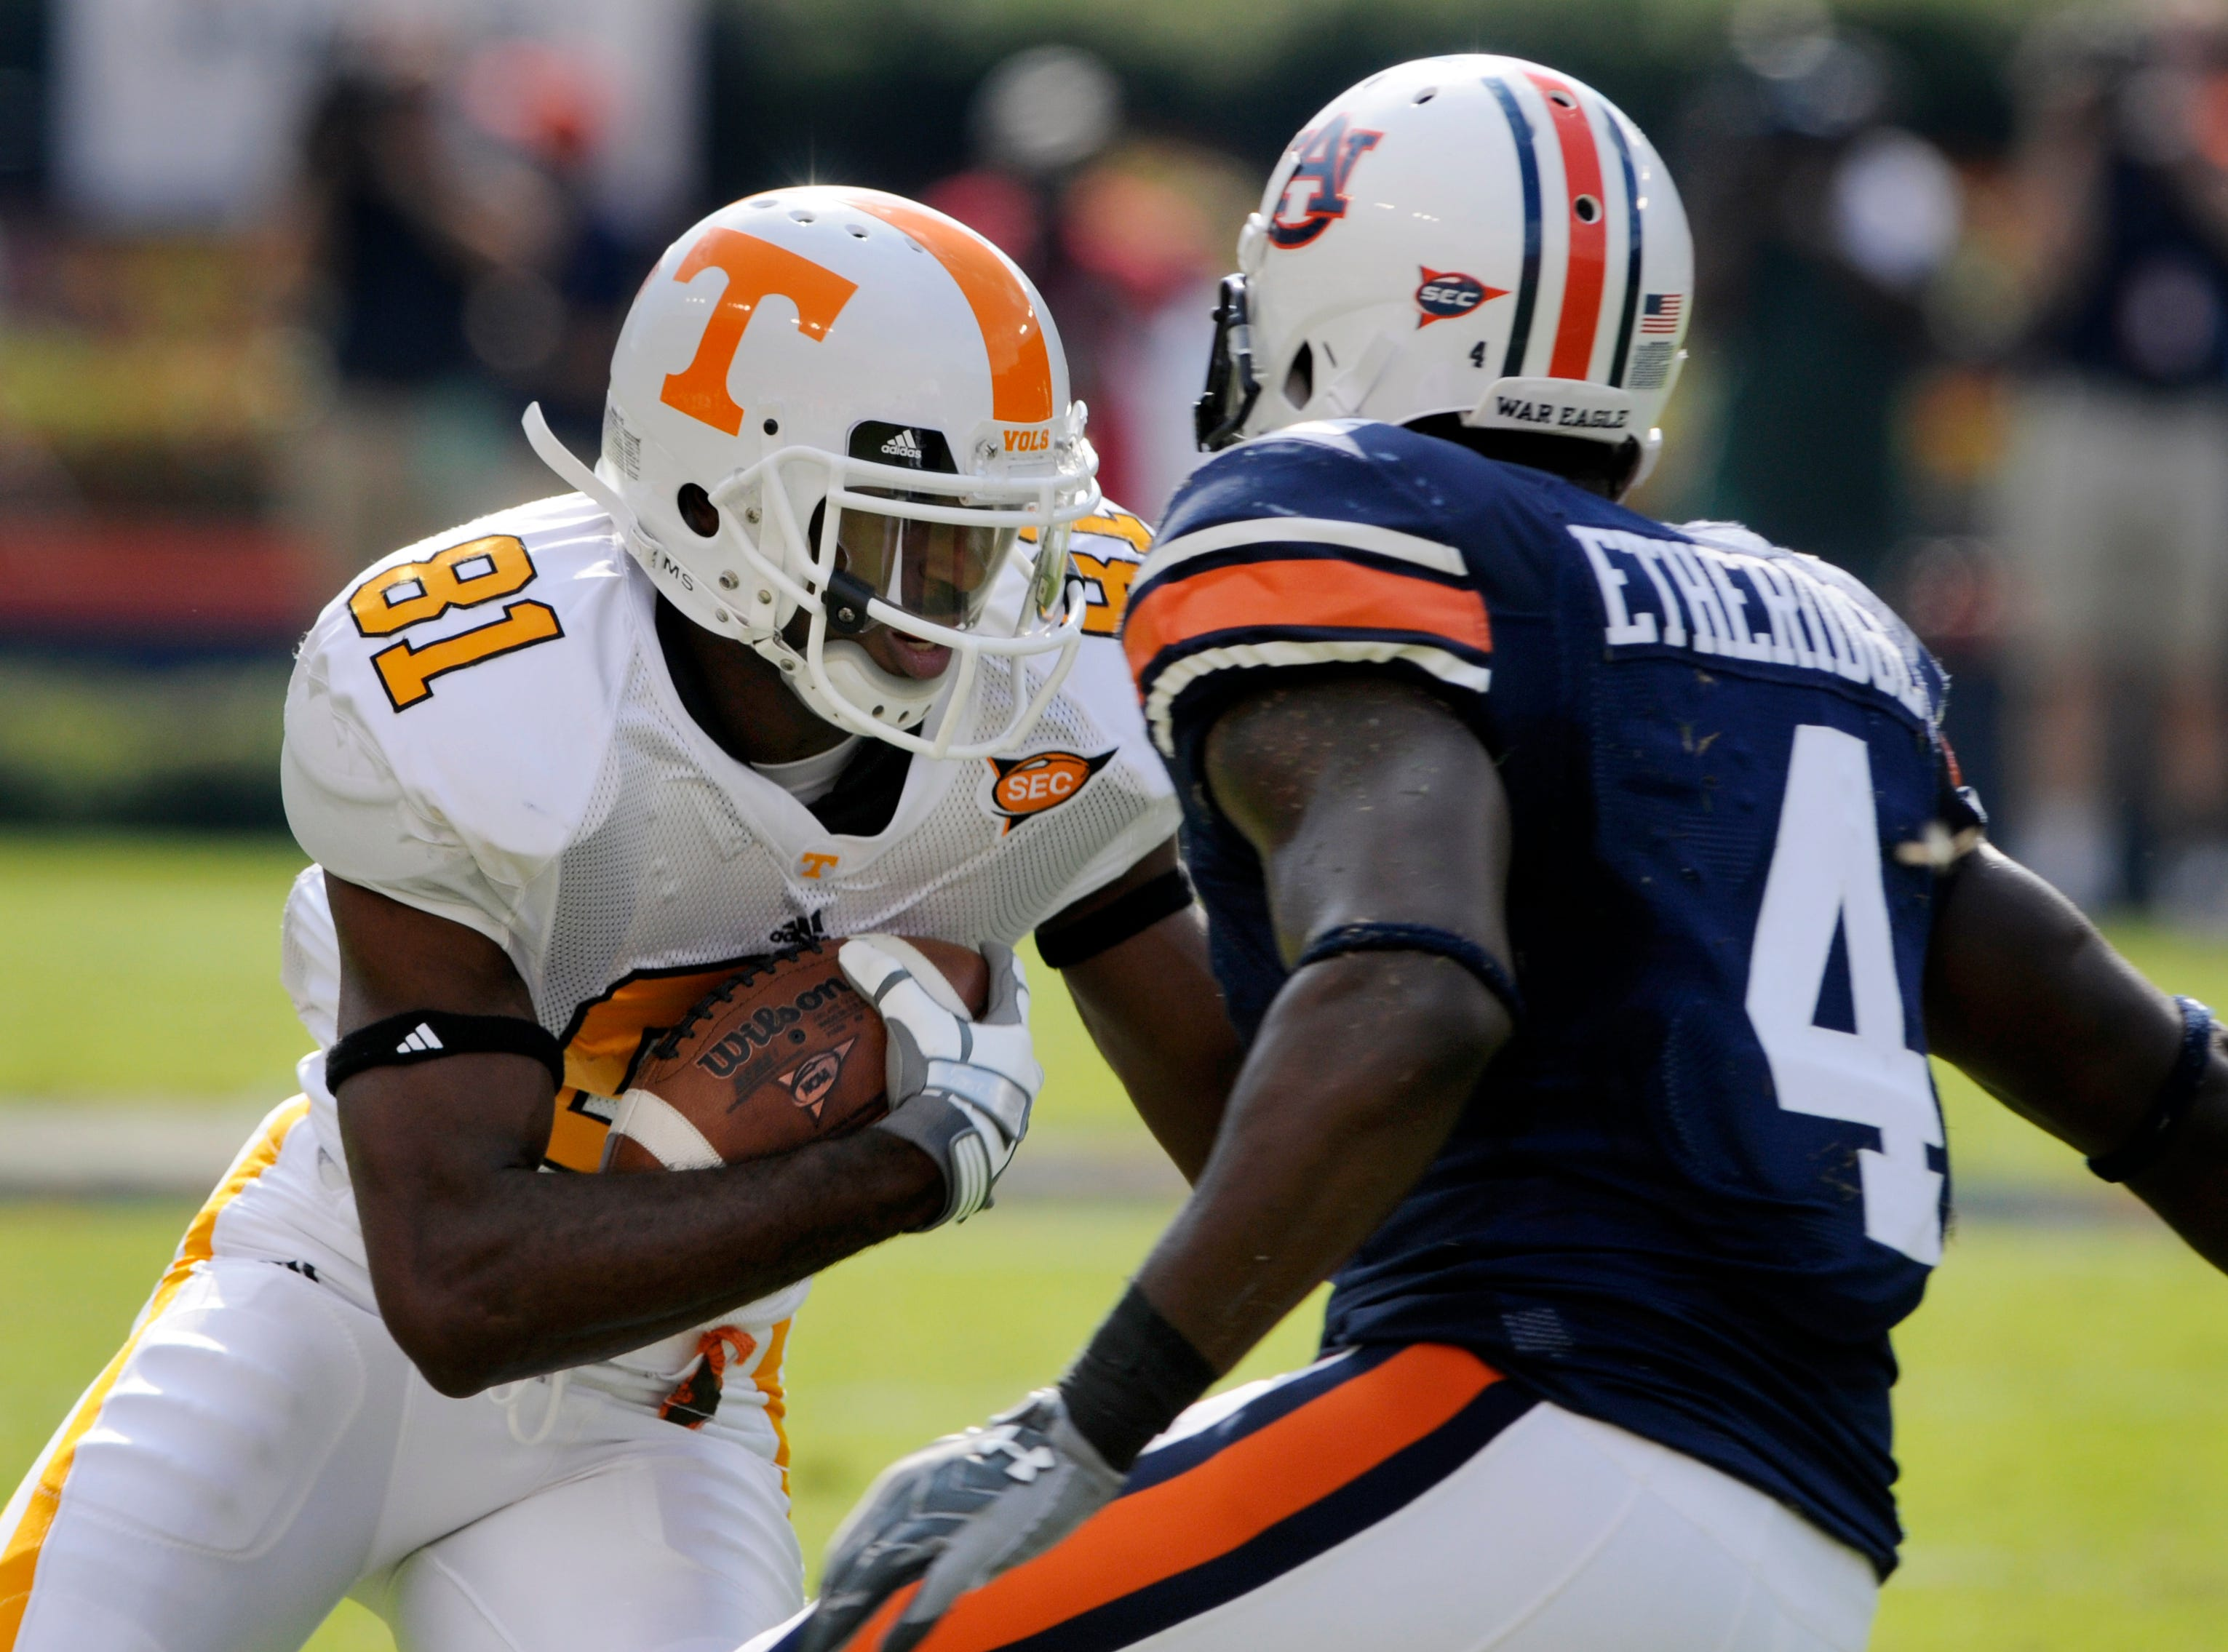 Tennessee wide receiver Josh Briscoe (81) tries to get around Auburn defensive back Zac Etheridge (4) Saturday in Jordan-Hare Stadium in Alabama in 2008. Auburn won 14-12, dropping the Vols' season record to 1-3.